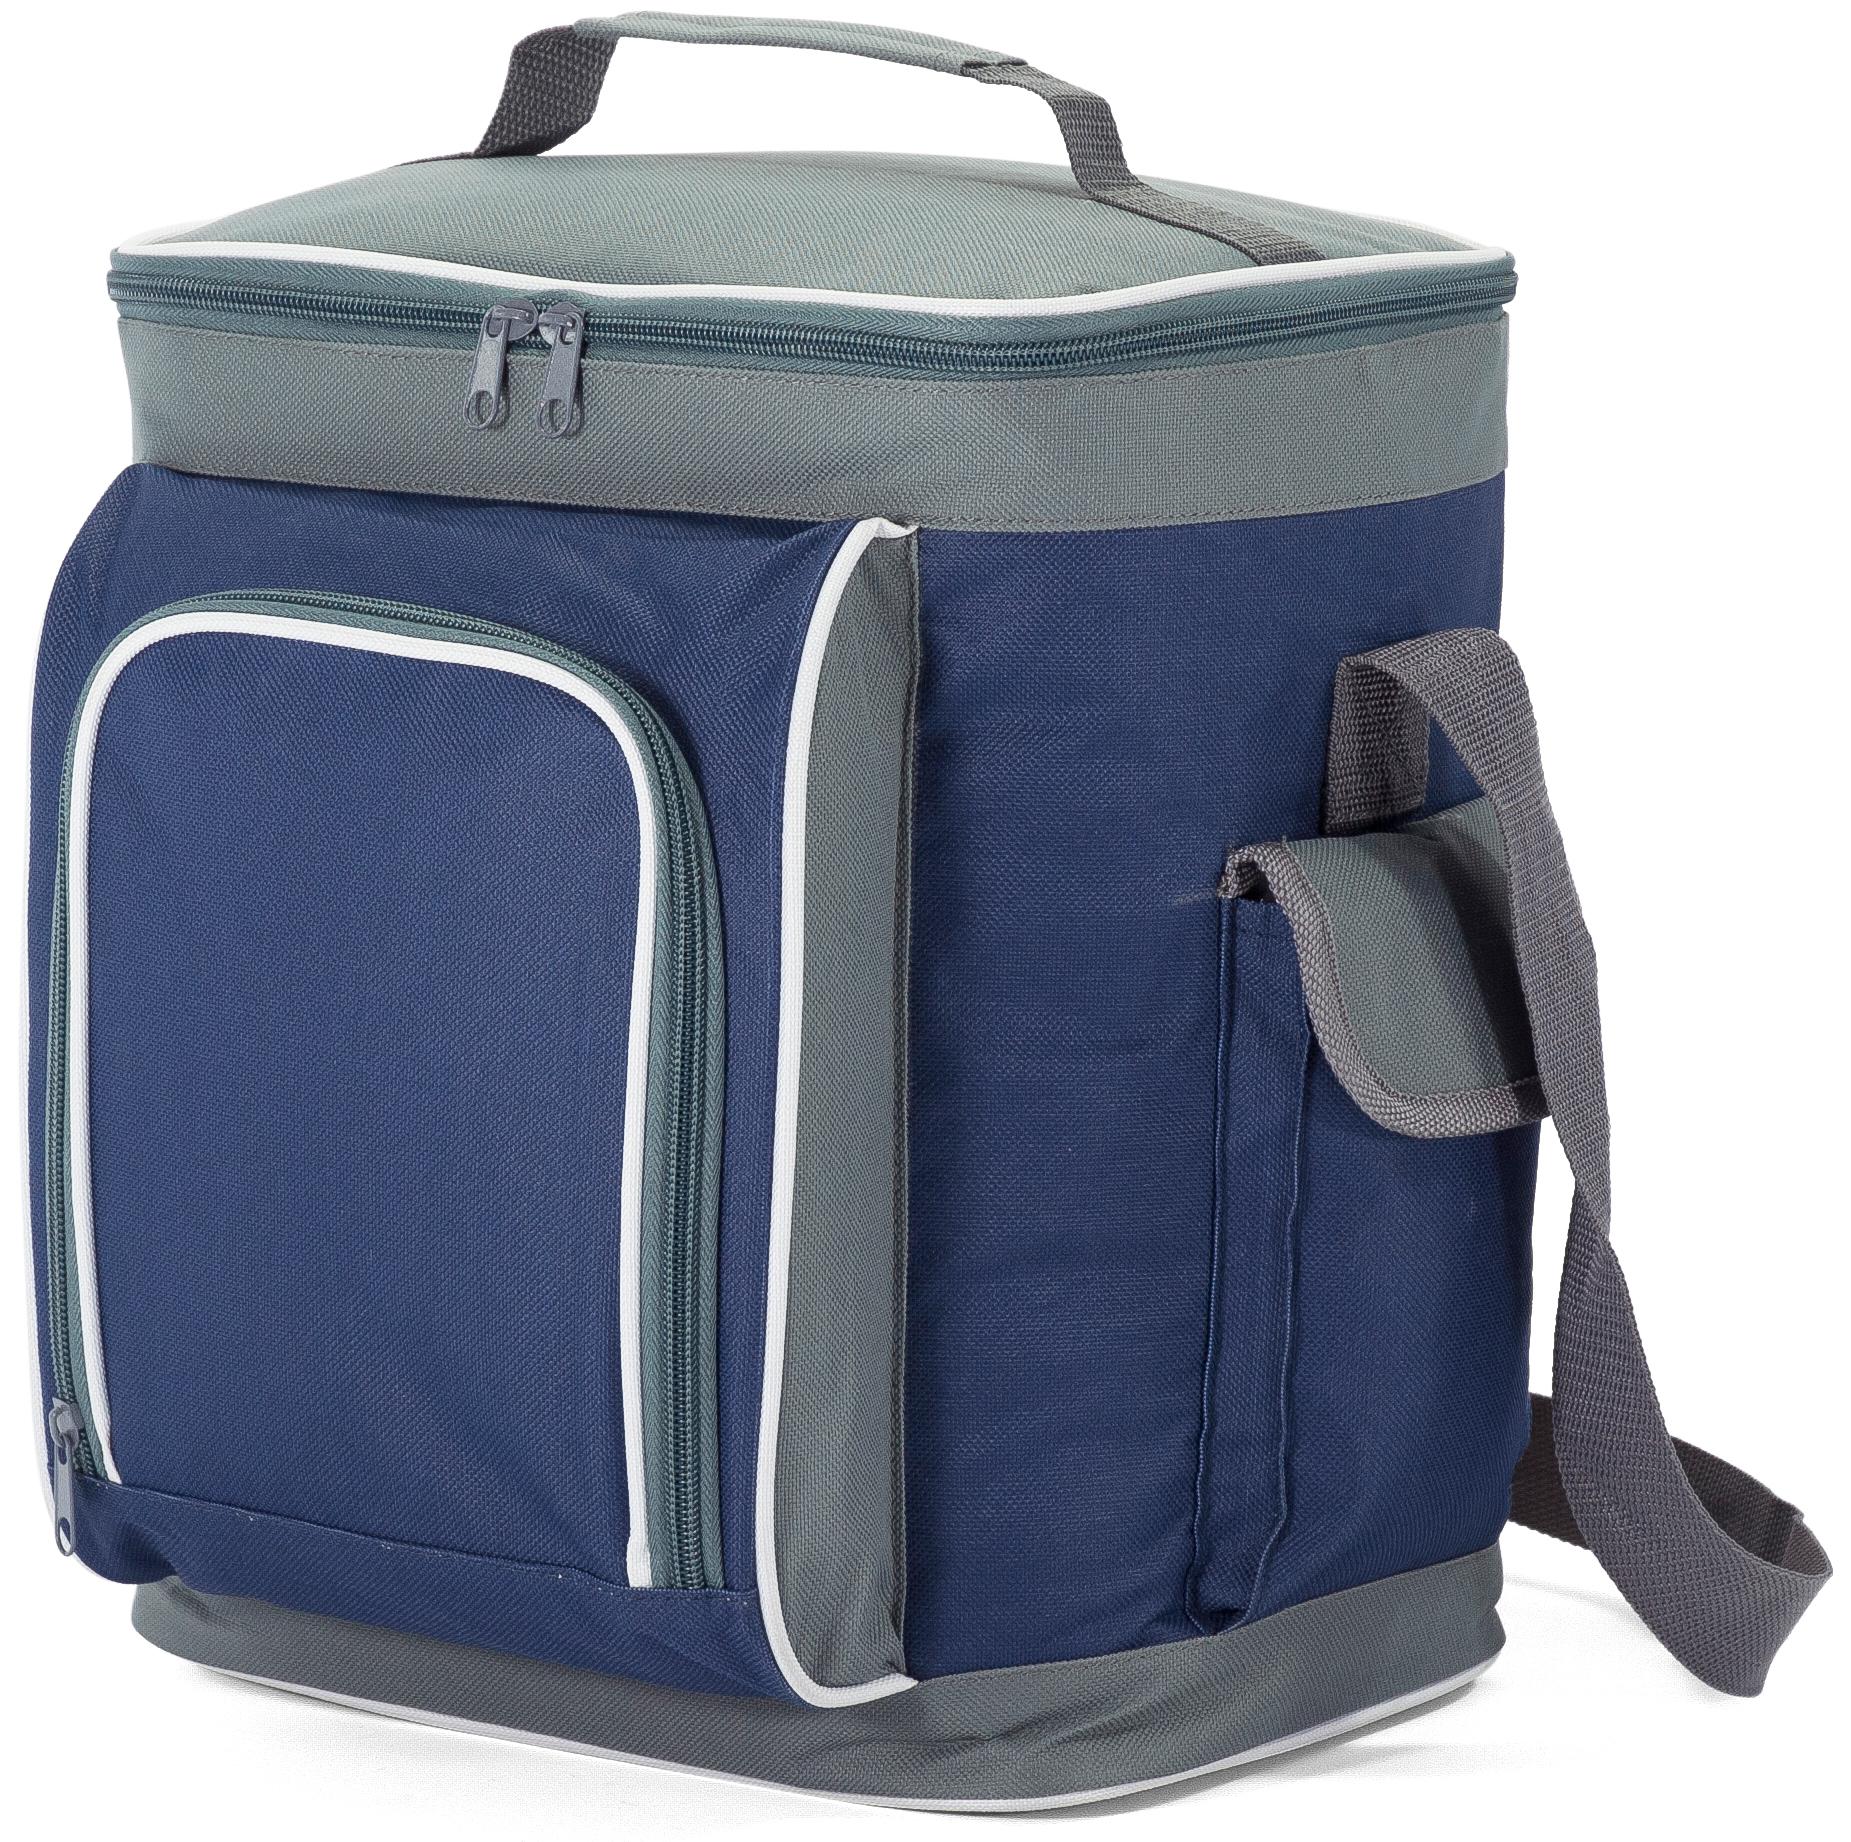 86ddd42349 Ισοθερμική Τσάντα με 3 Εξωτερικές Τσέπες Benzi BZ5140 Μπλε · 14.63€ ». Από  bagz · Παιδική Βαλίτσα-Περπατούρα   Τσάντα Πλάτης Chase ΡΡΒΟΟ1 Paw Patrol  ...